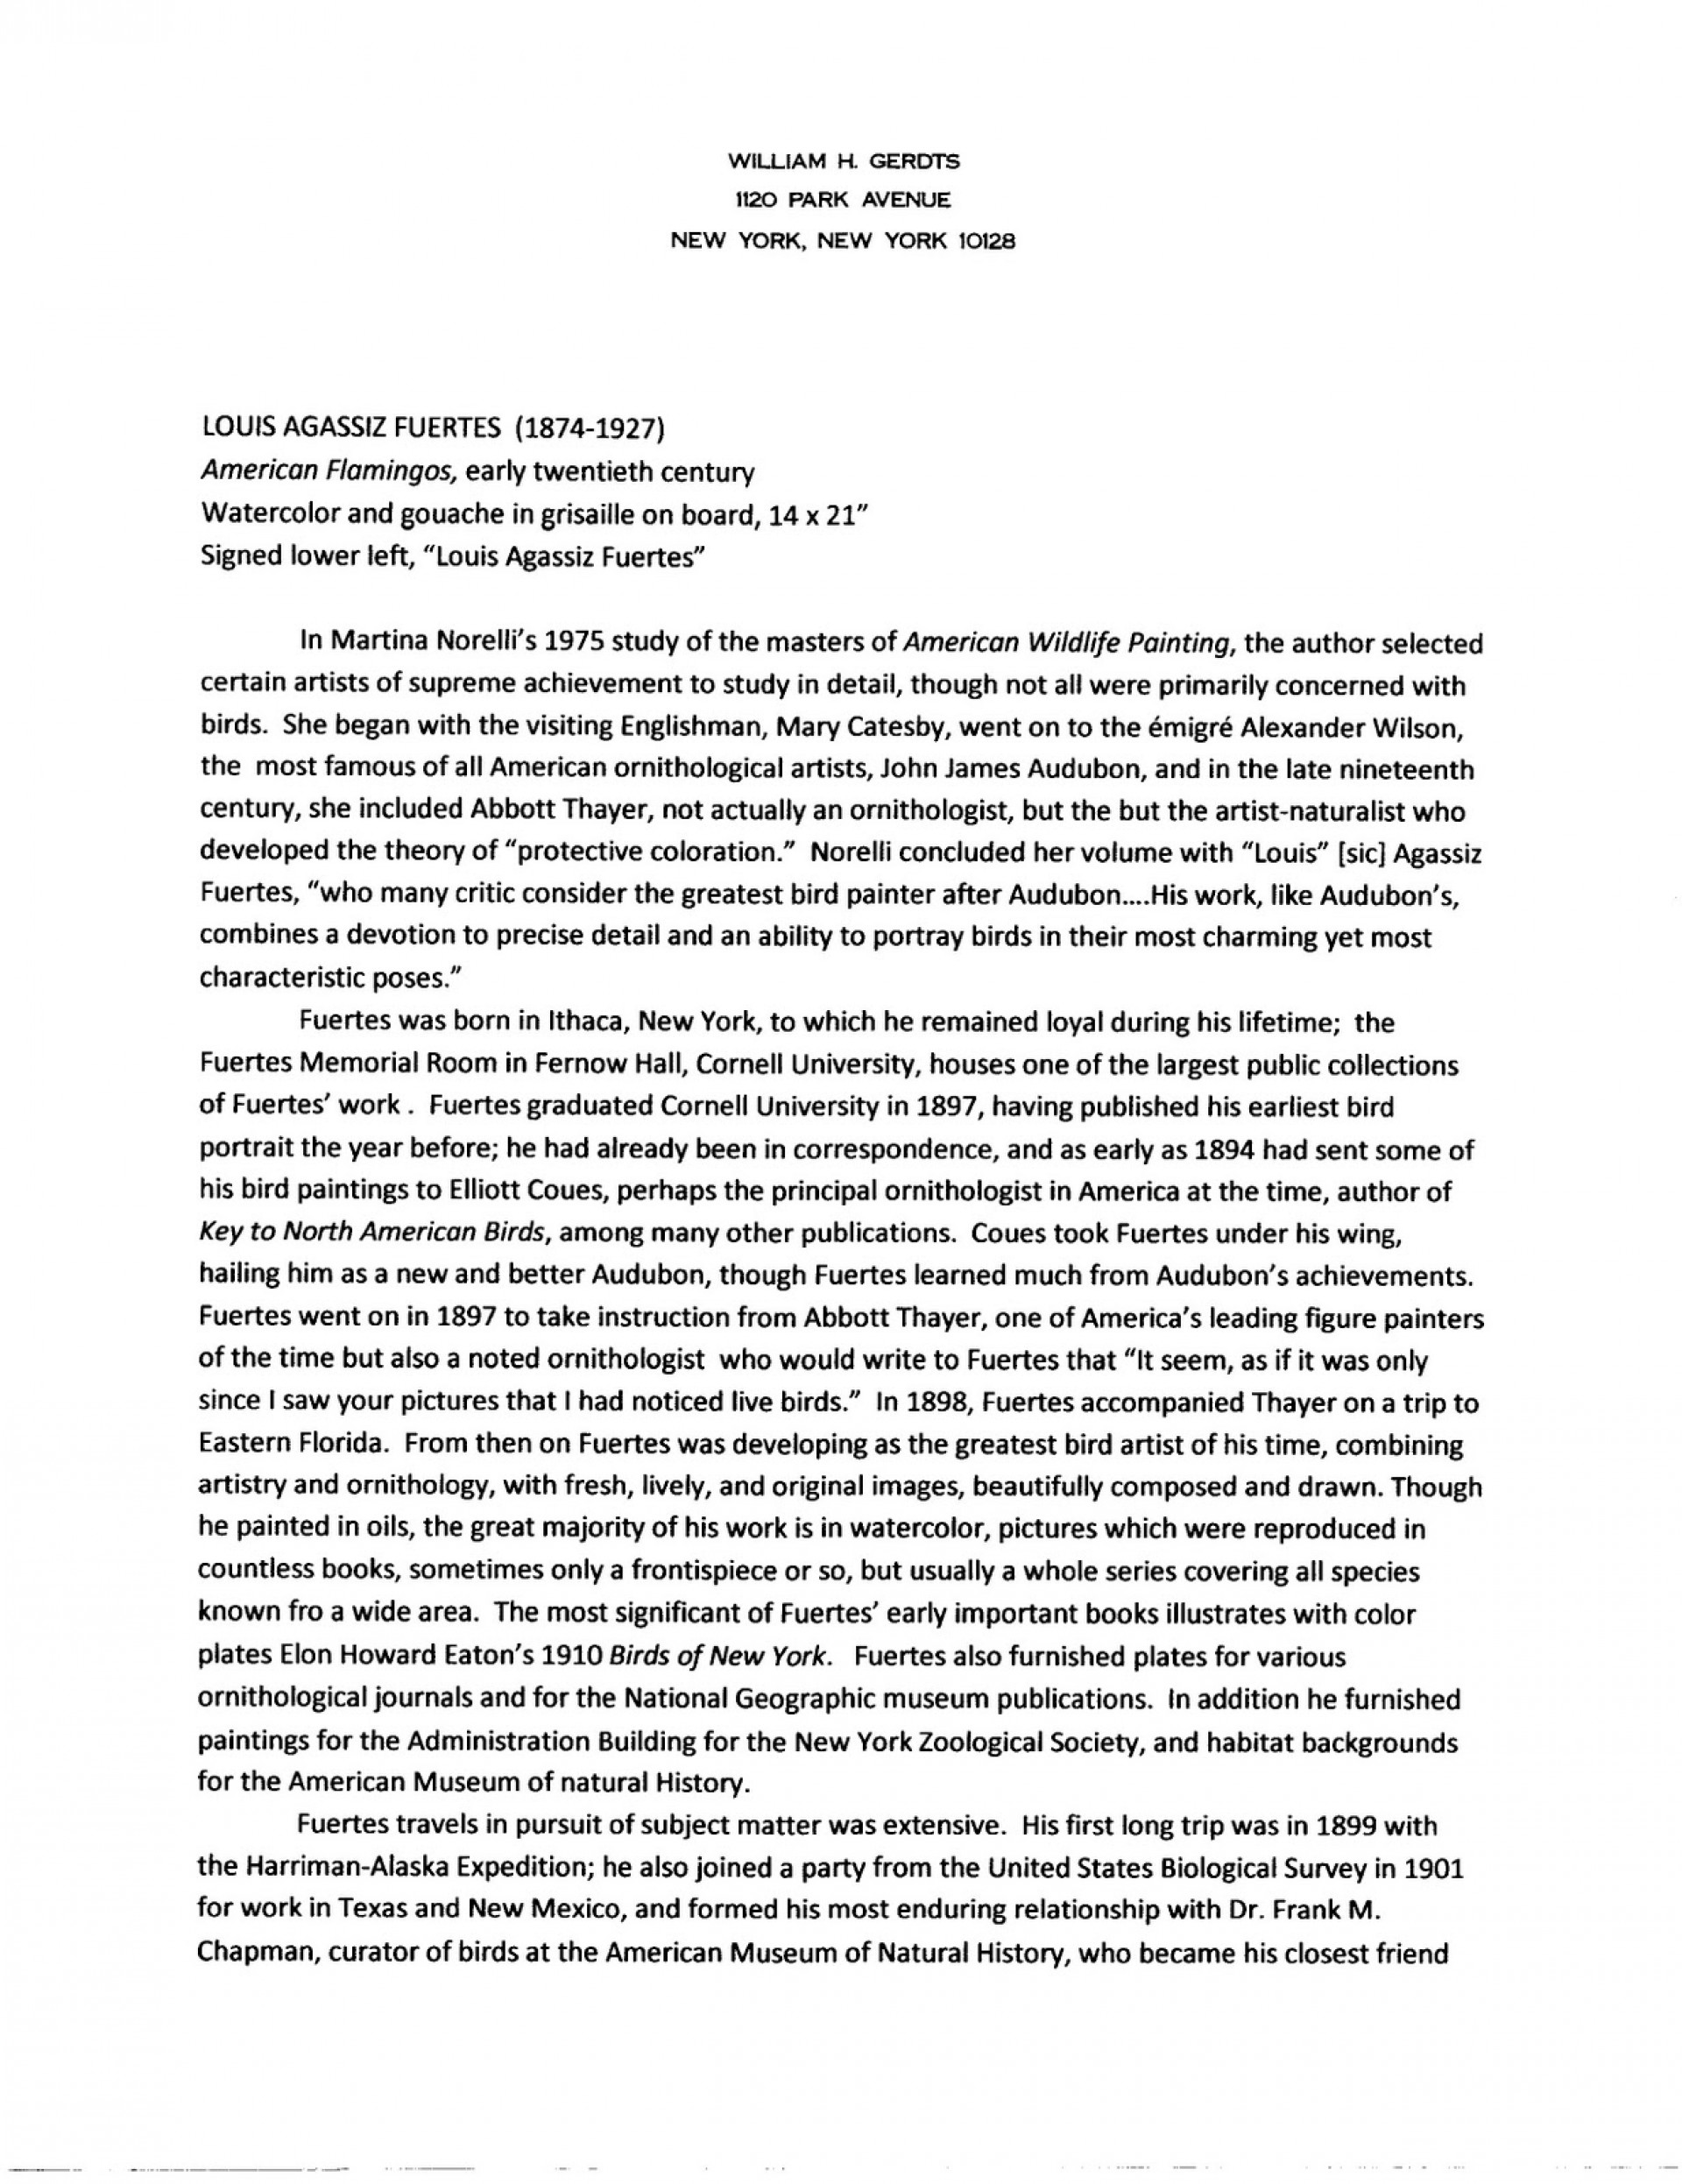 016 Comparative Essay Outline Fuertesamericanflamingos001 Singular Politics Research Paper 1920